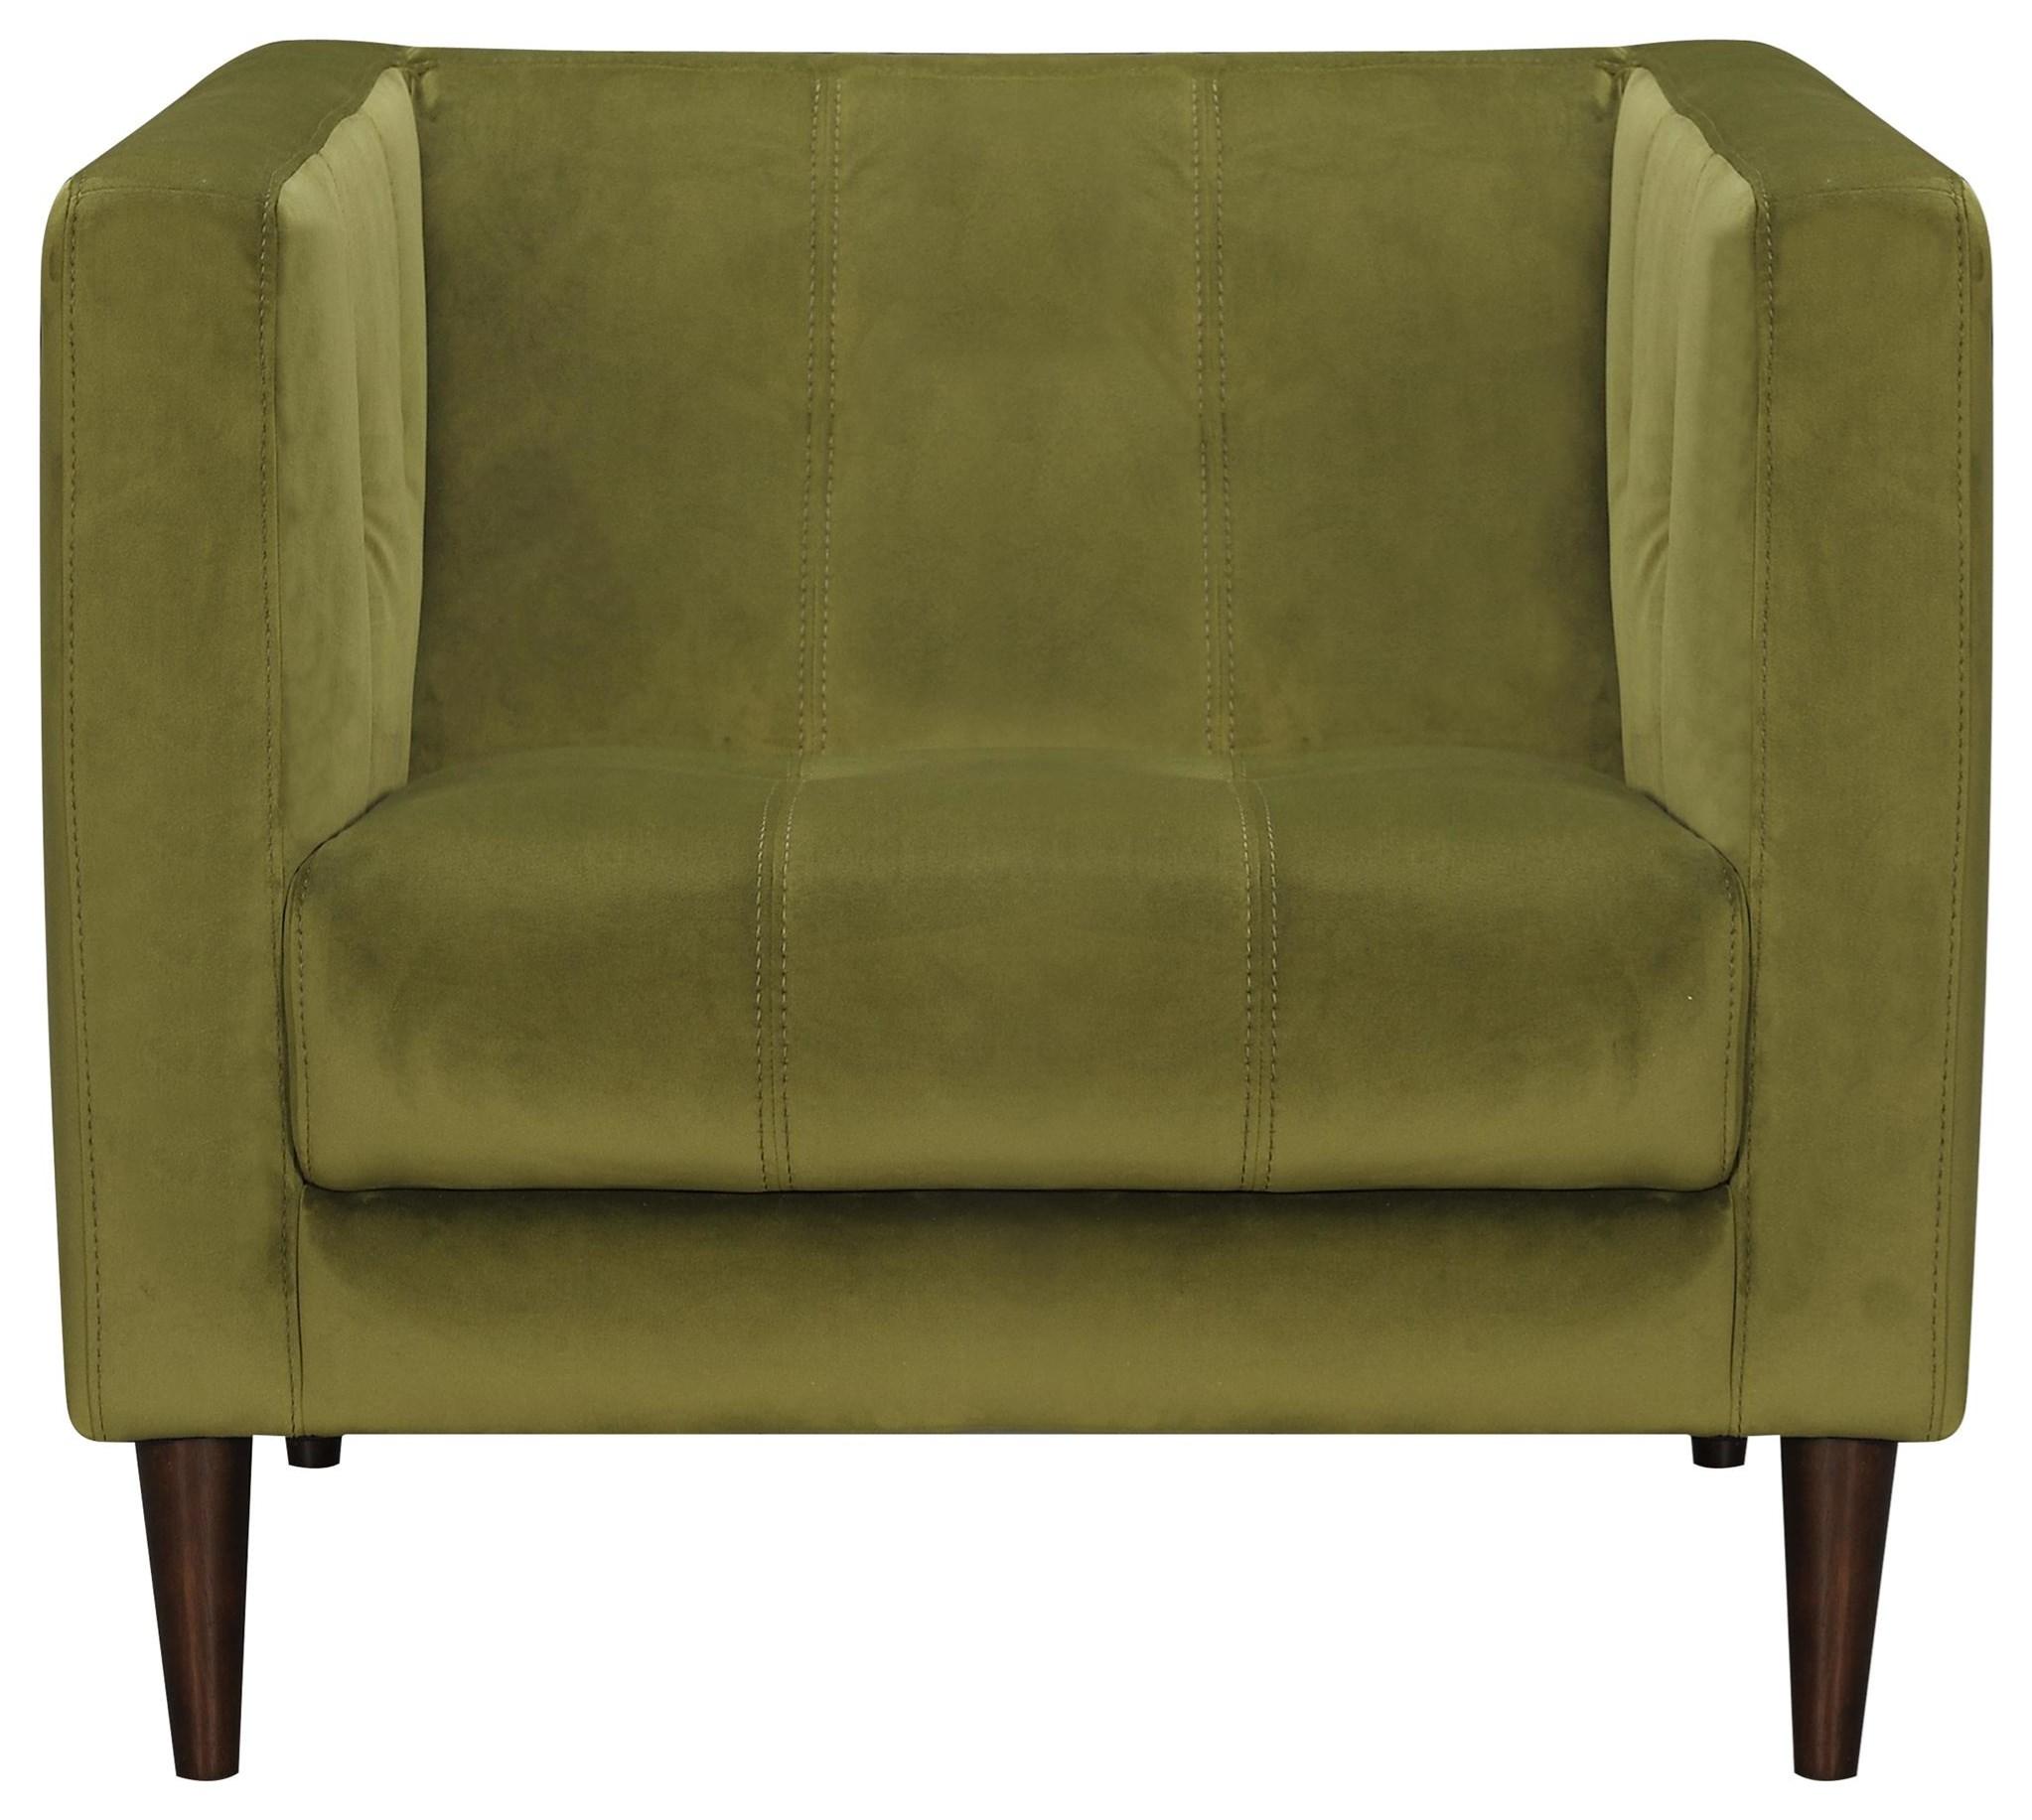 Olivia Chair by Violino at HomeWorld Furniture